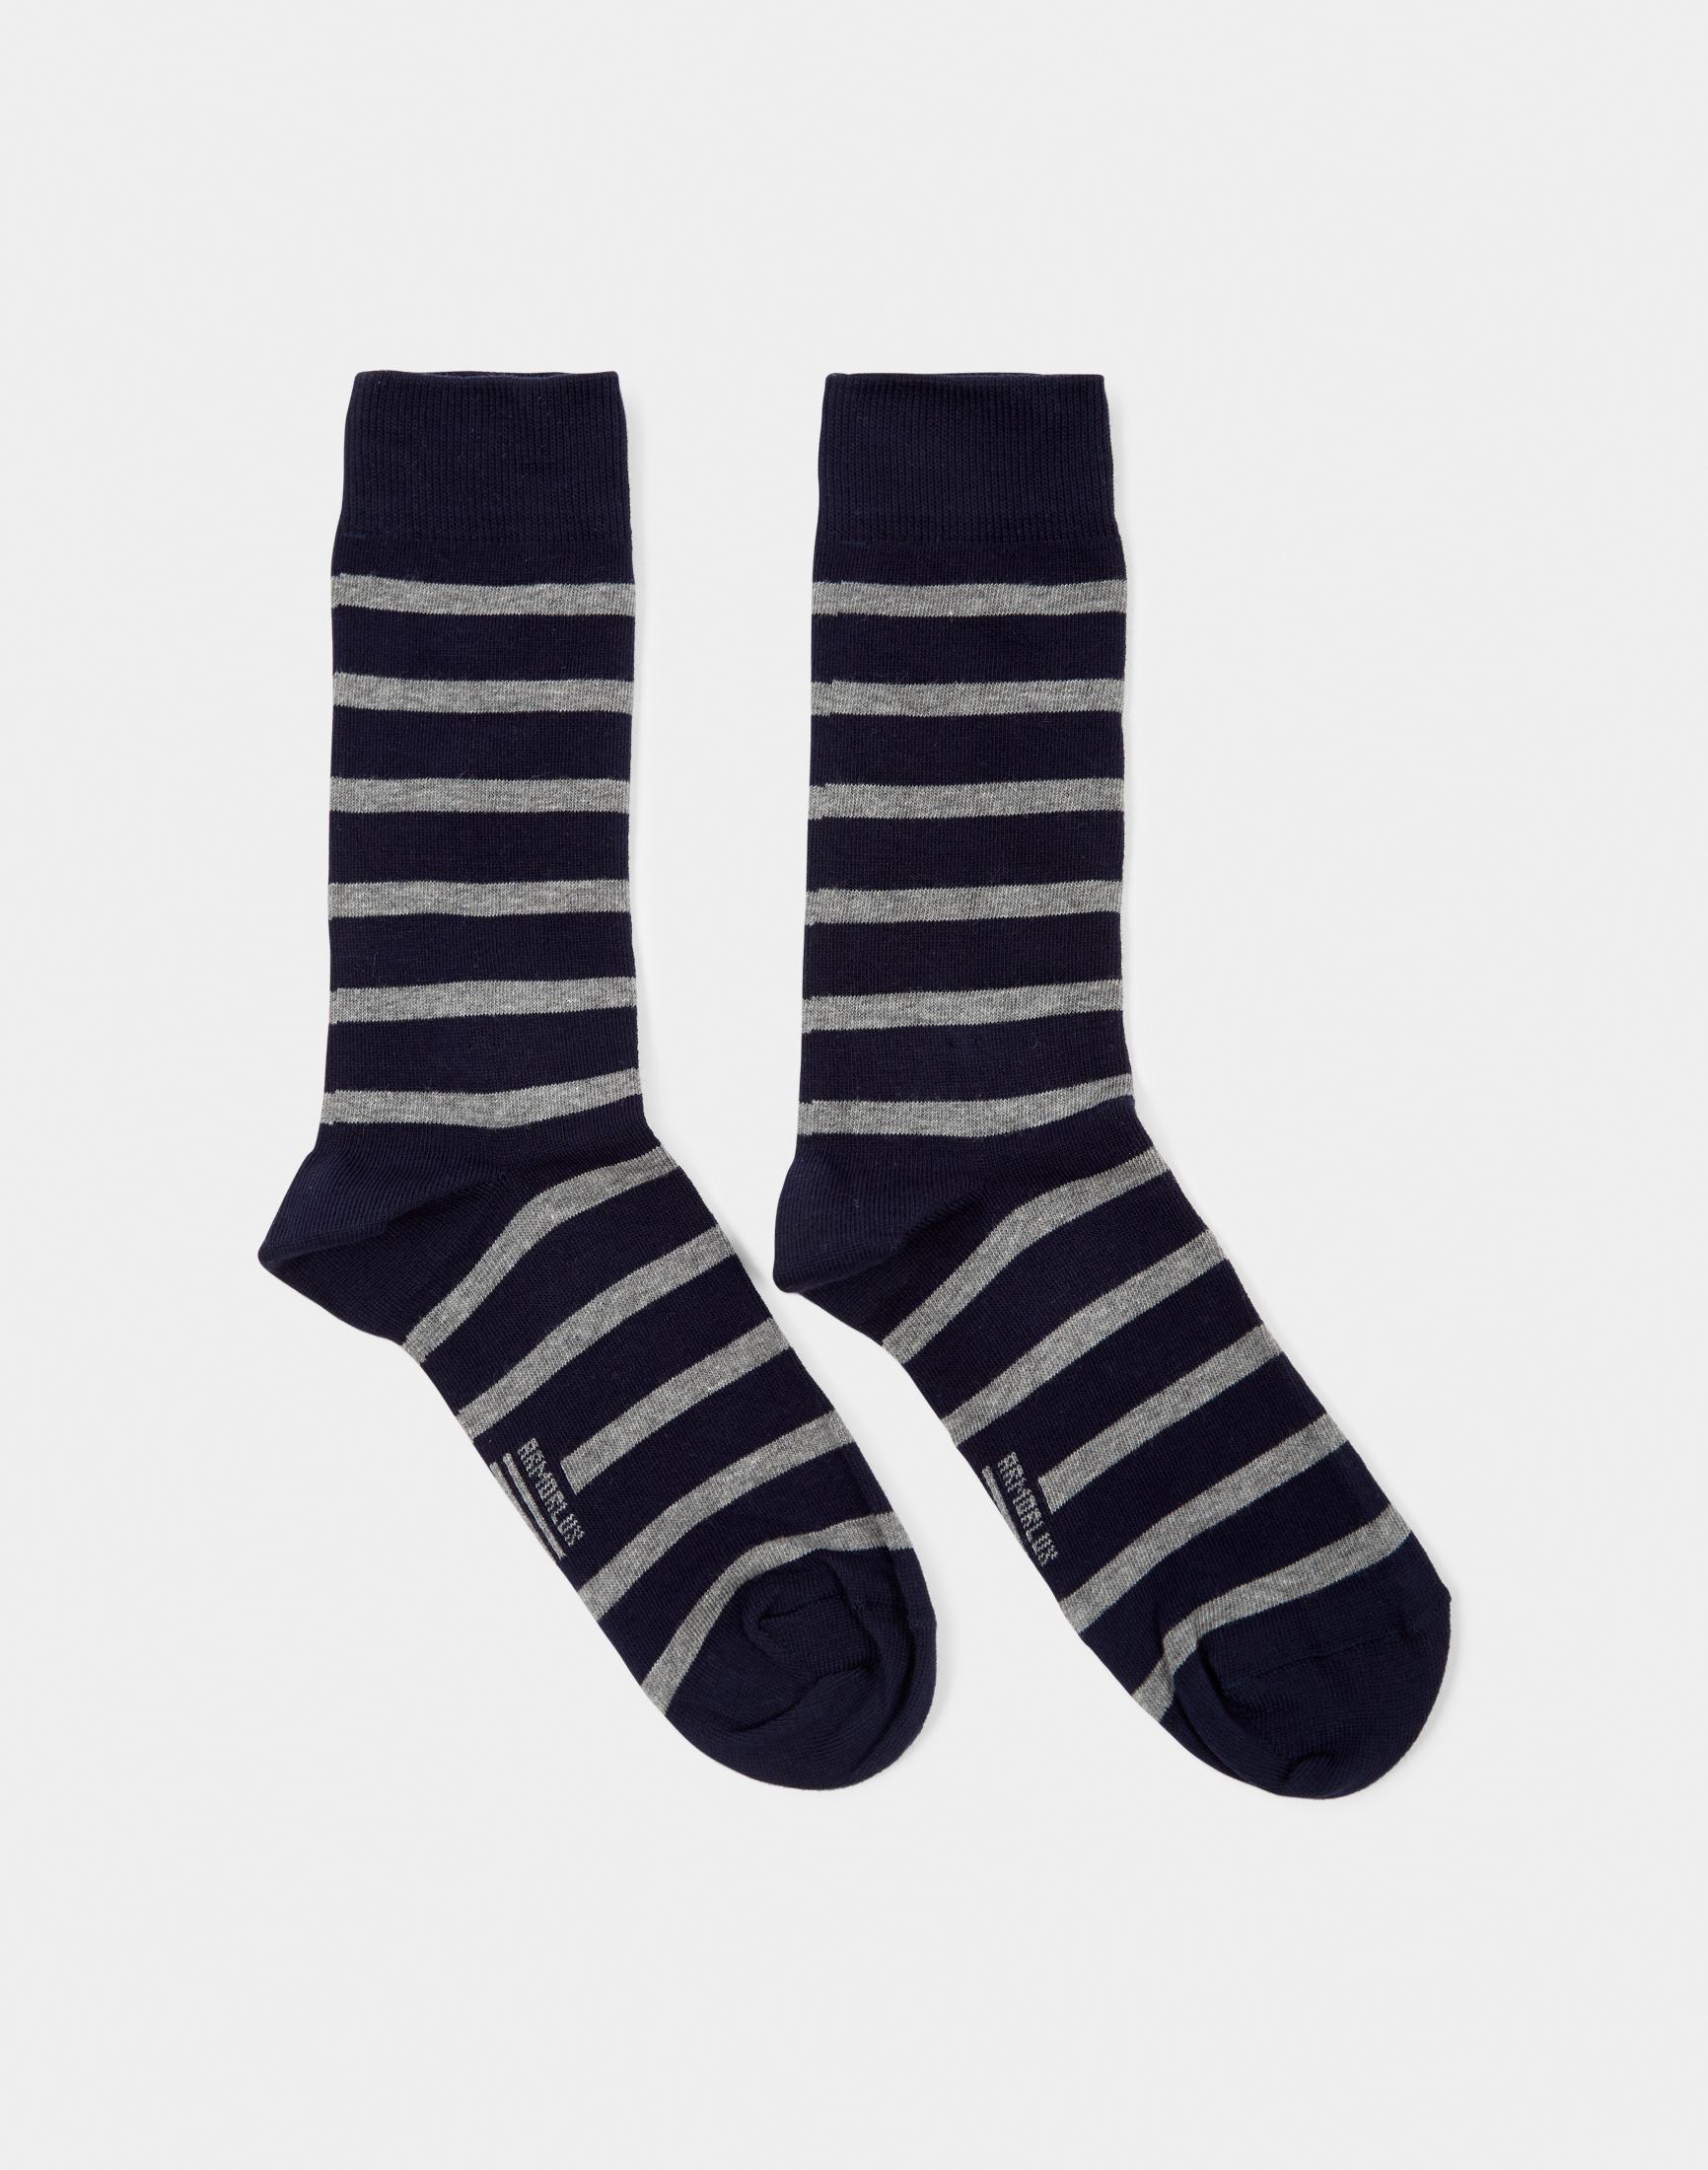 Armor Lux Chaussettes Homme Socks Black   Grey - Black in Black for ... 222b87460c2